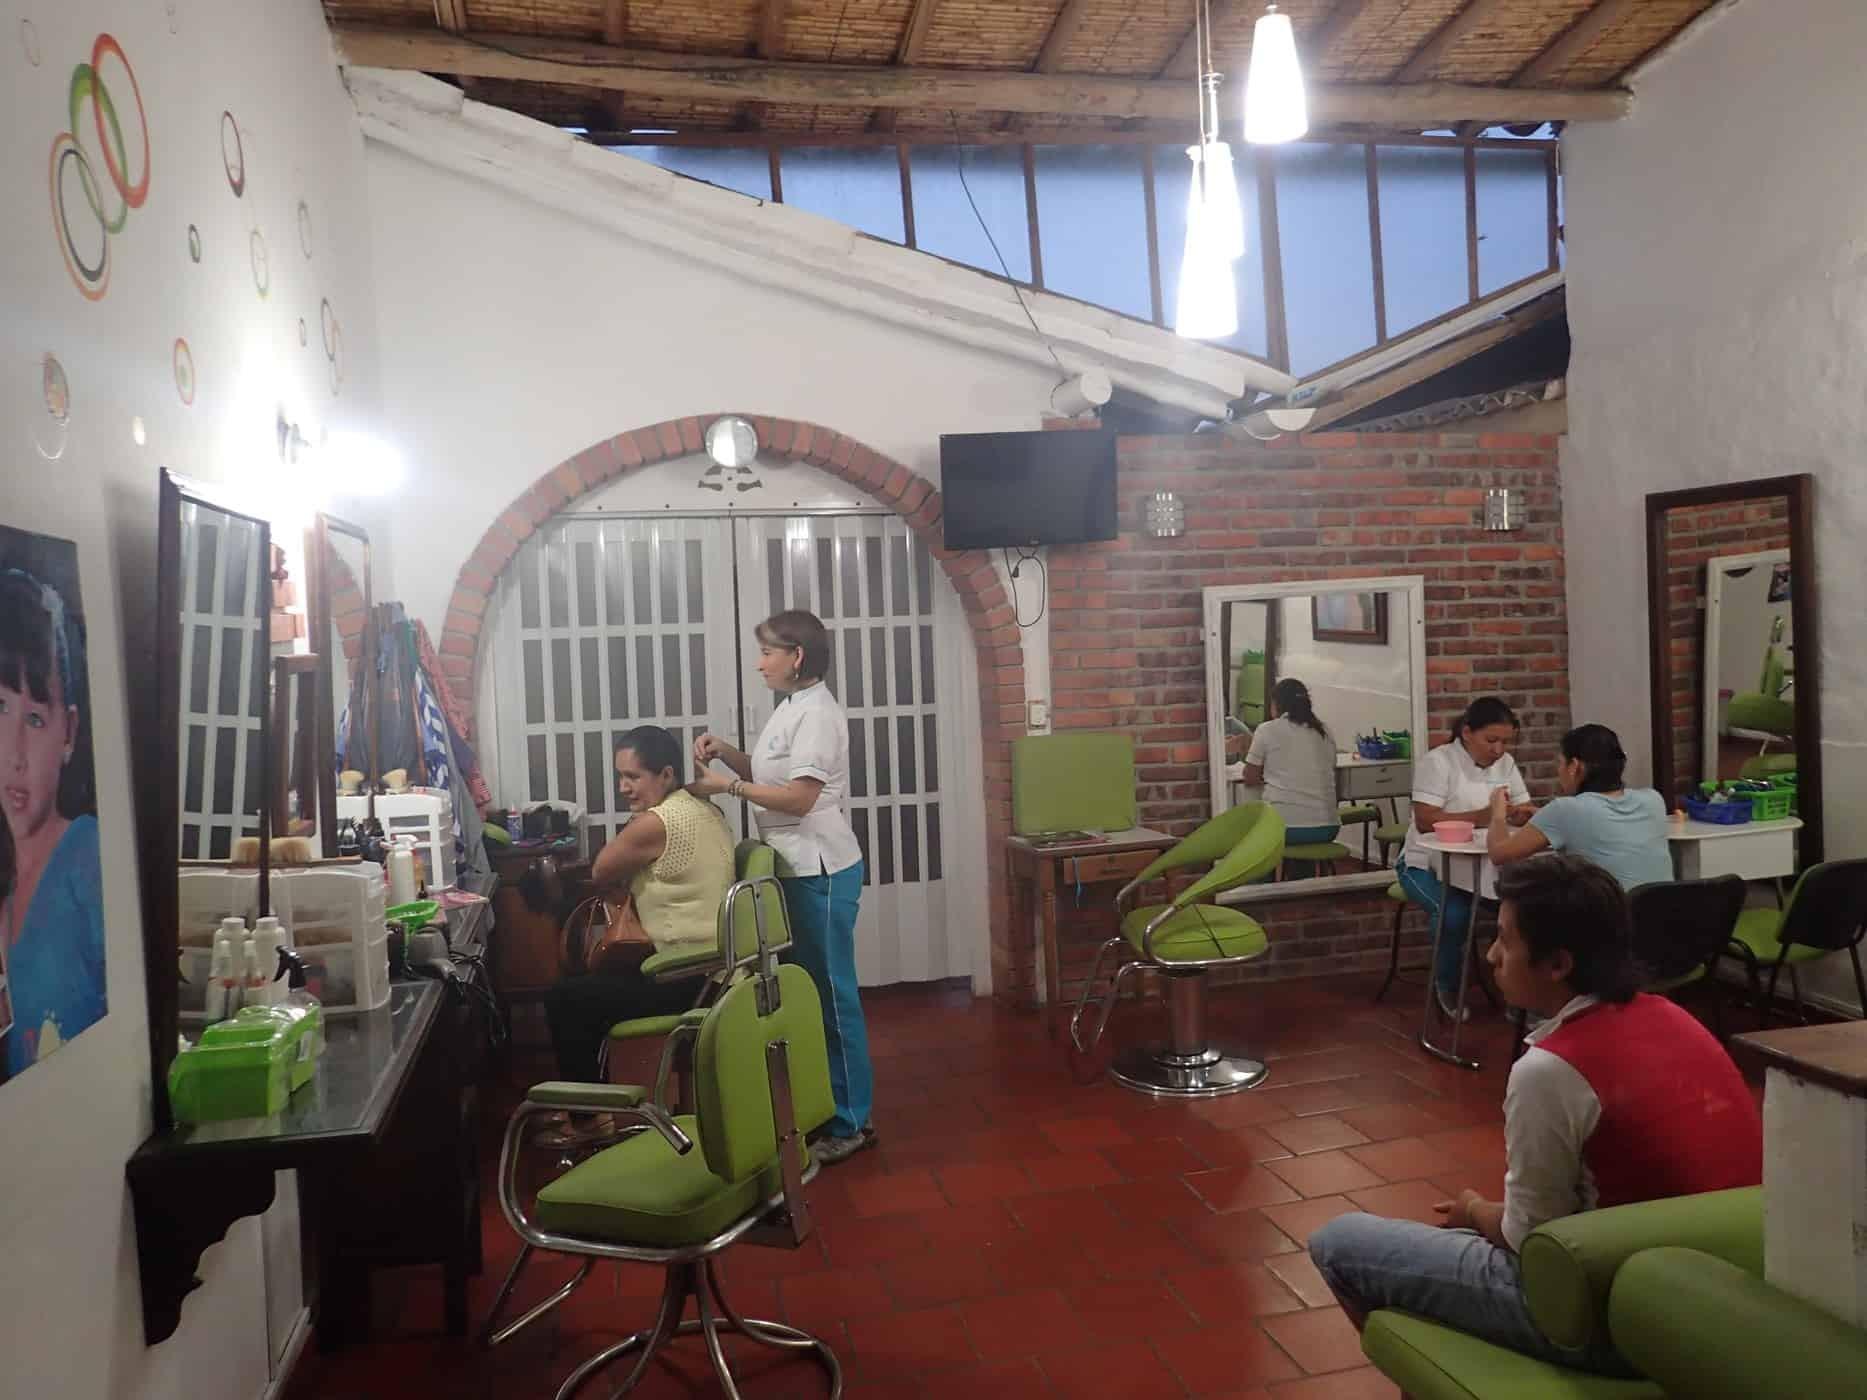 Yaja Sala de Belleza in Barichara, Colombia.